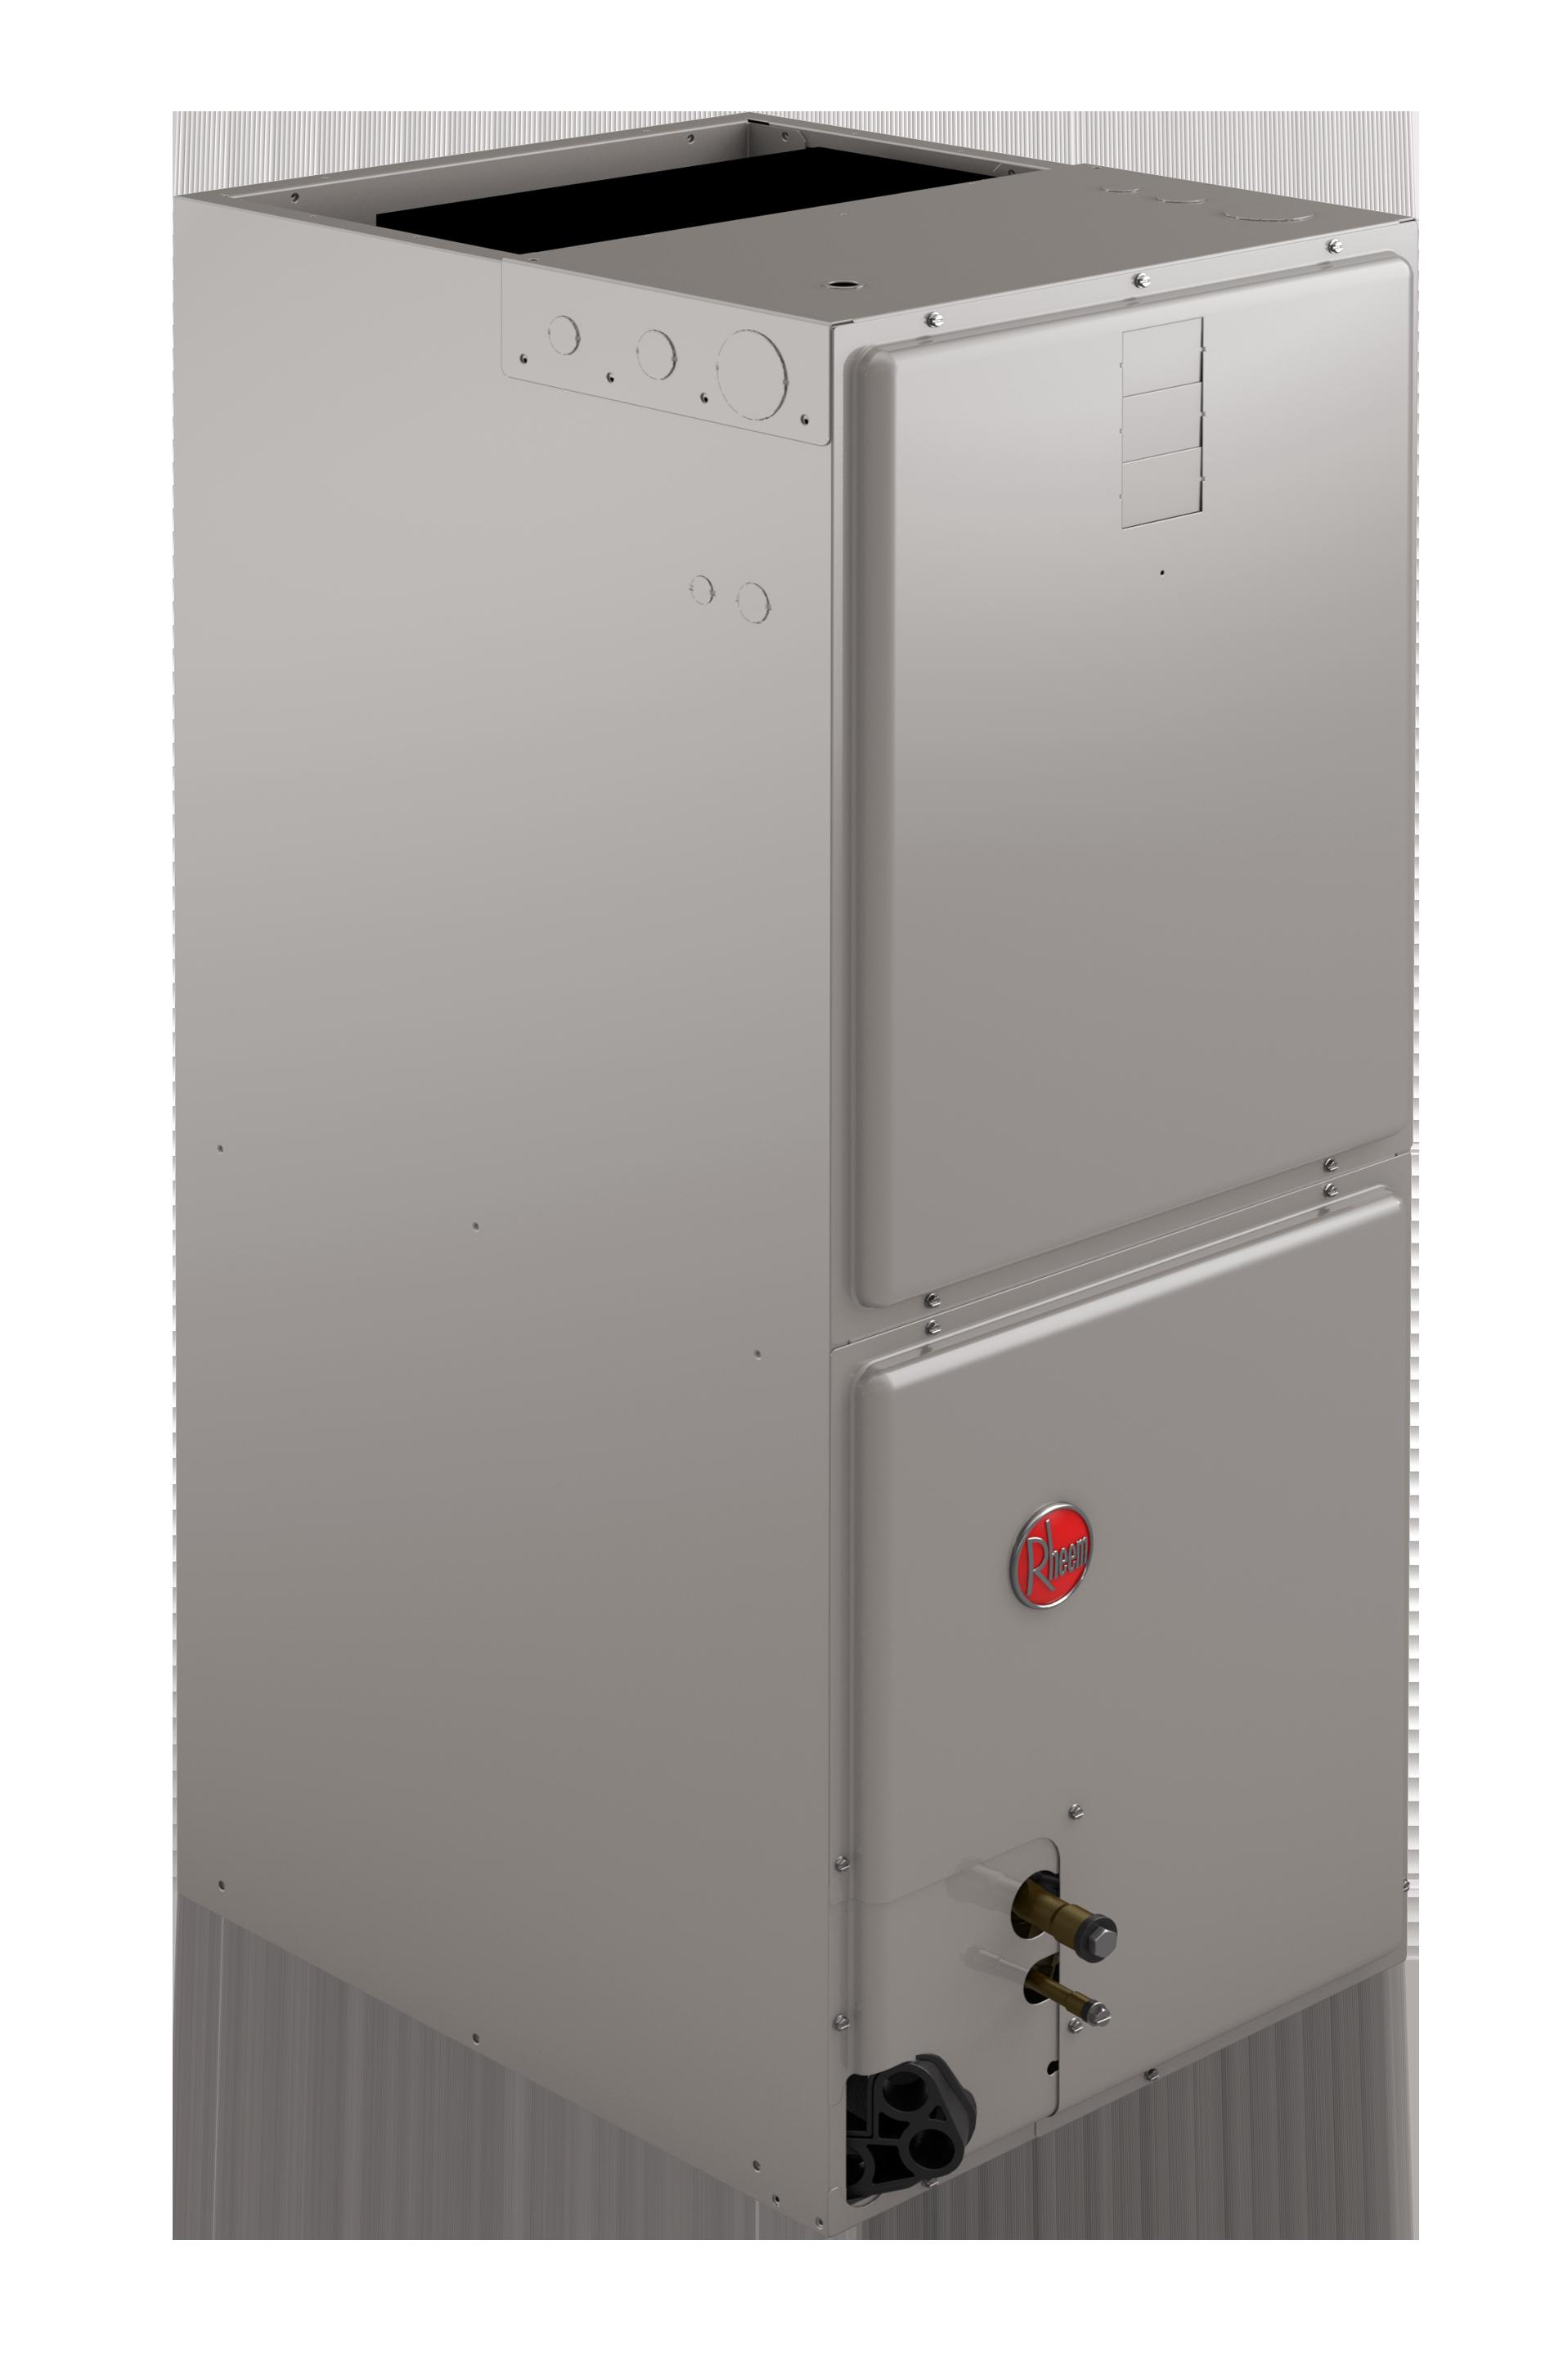 5.0 Ton Rheem RH1T High Efficiency Air Handler